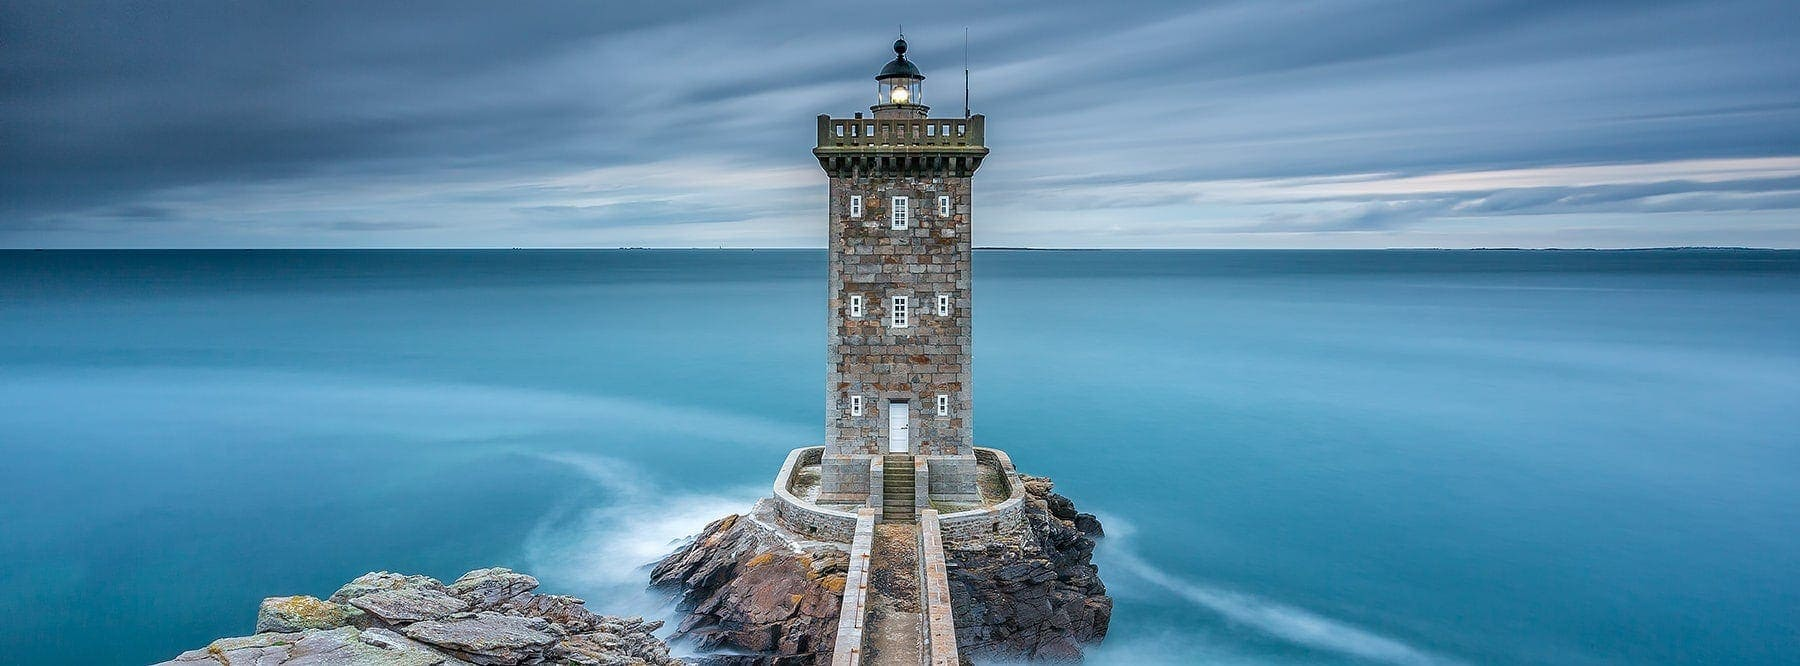 Landscape Seascape Photography Workshop Brittany France